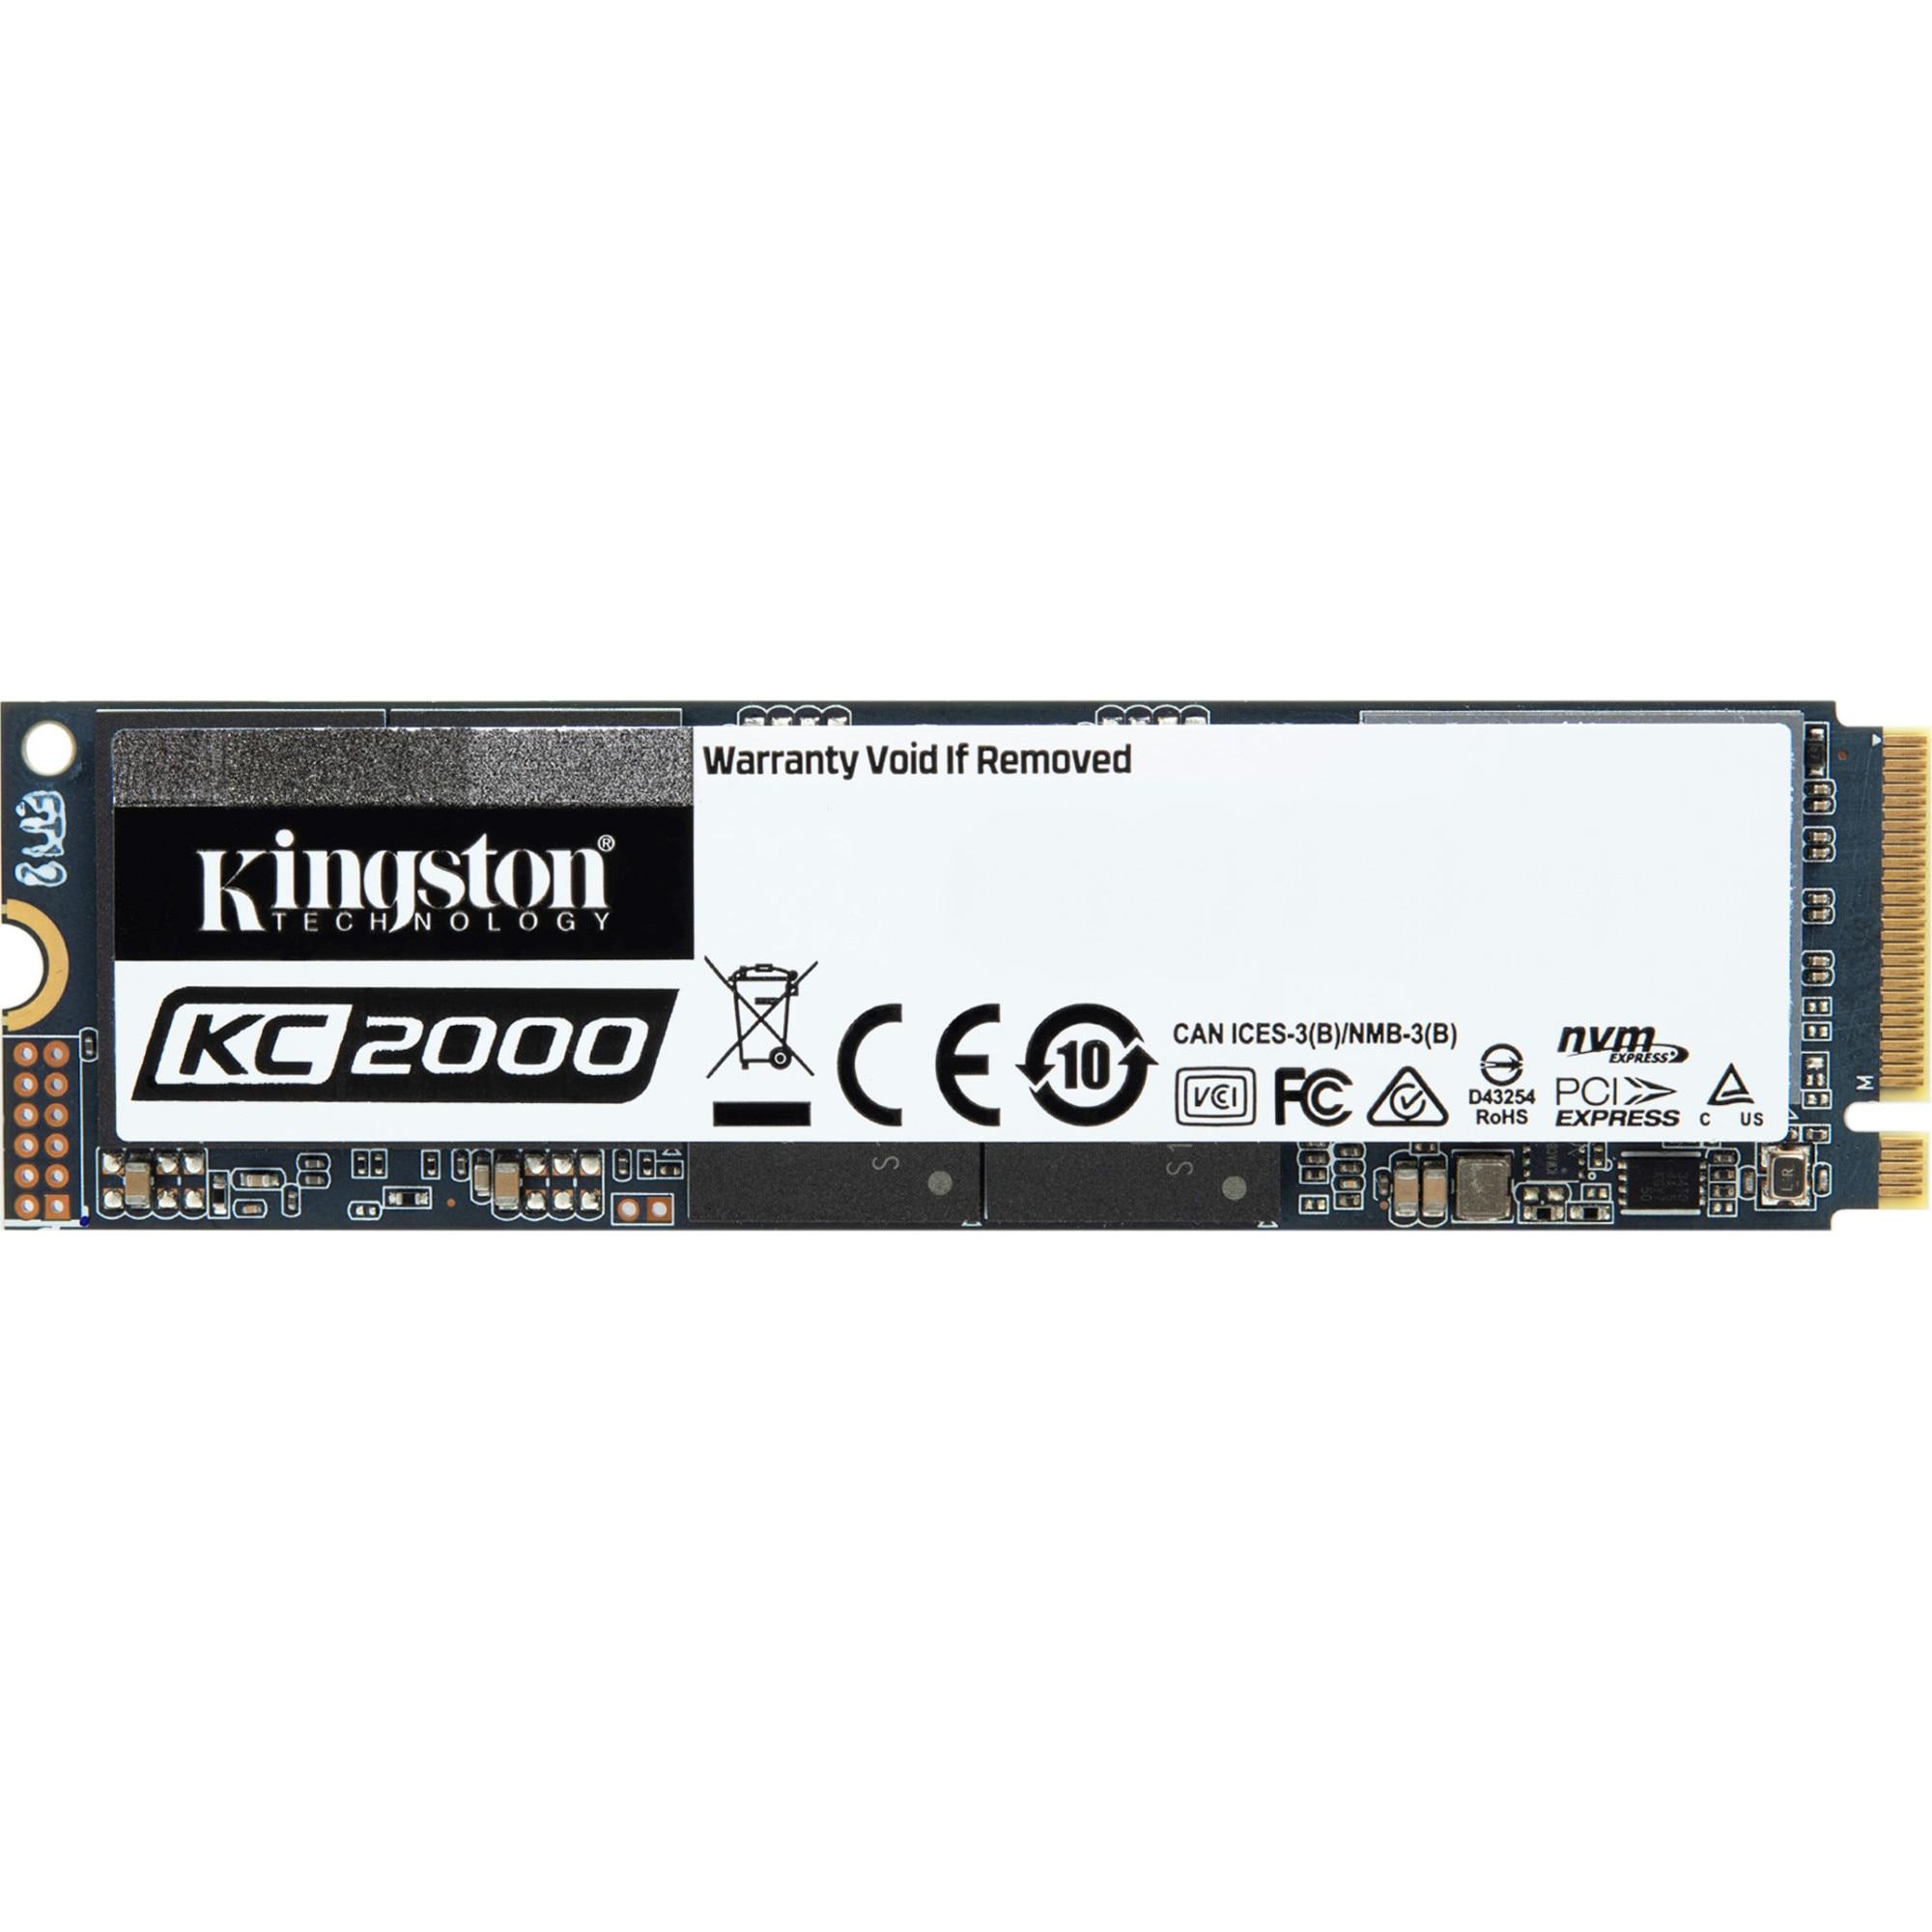 Fotografie Solid-state drive (SSD) Kingston KC2000, 250GB, M.2, NVMe